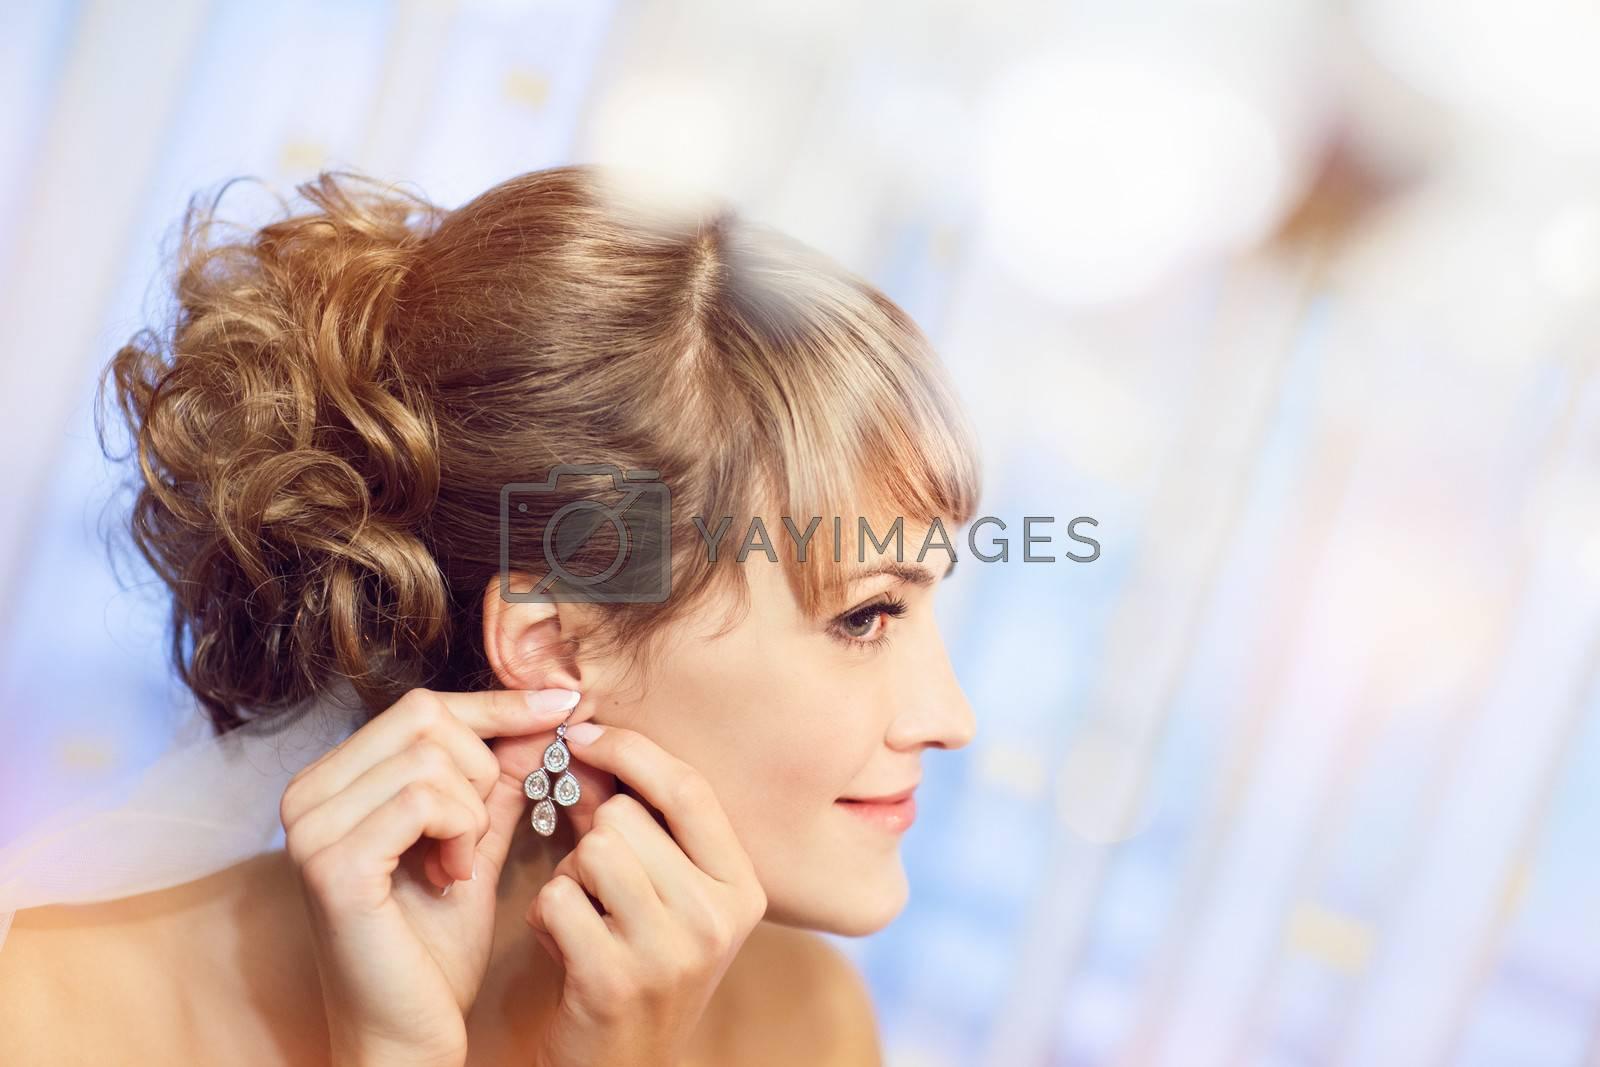 girl puts on an earring